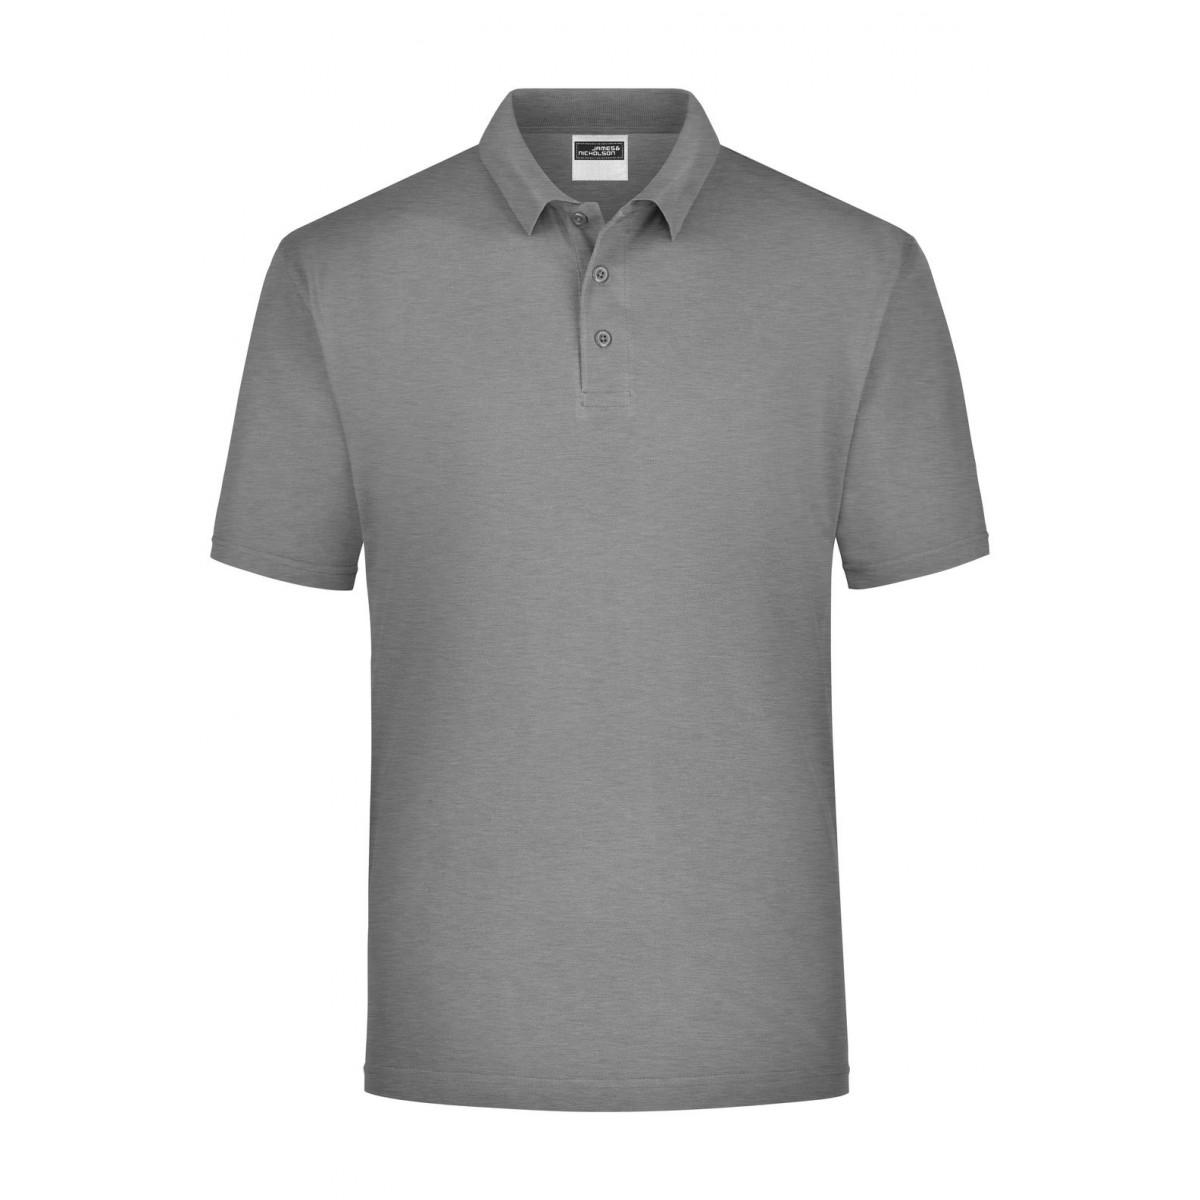 Рубашка поло мужская JN021 Polo Piqué Heavy - Серый меланж